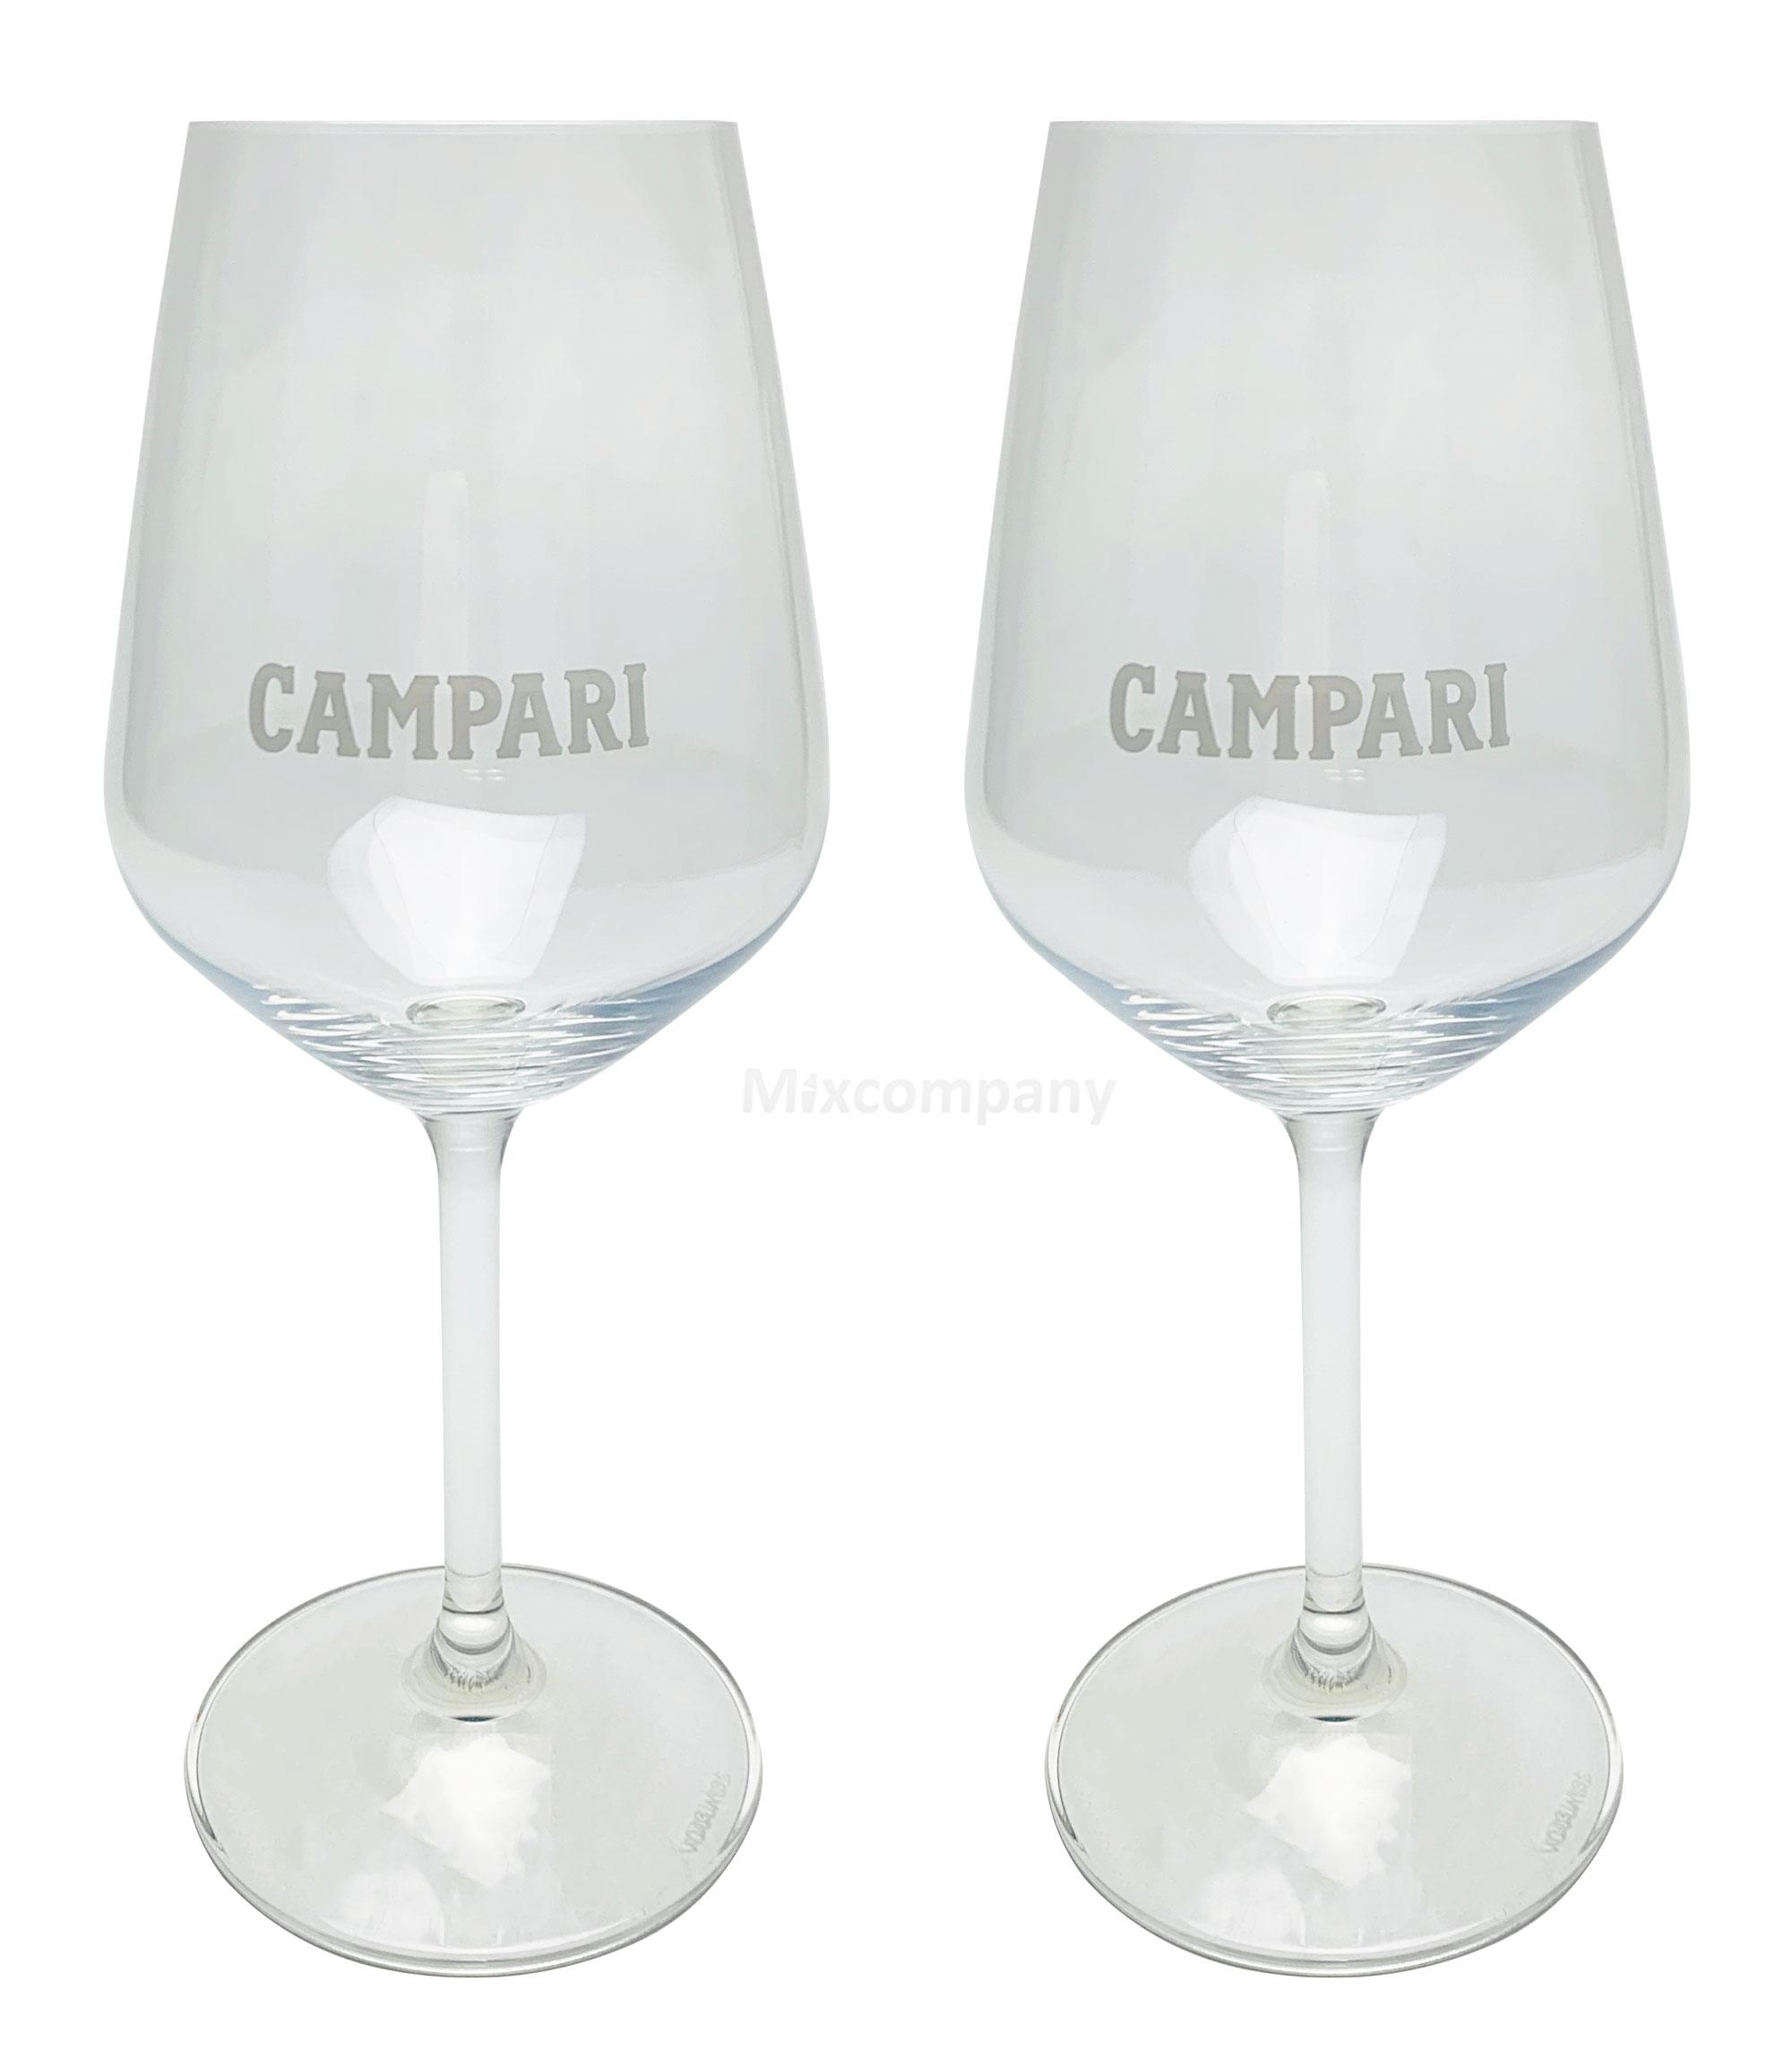 Campari Glas Gläser Set - 2x Weingläser